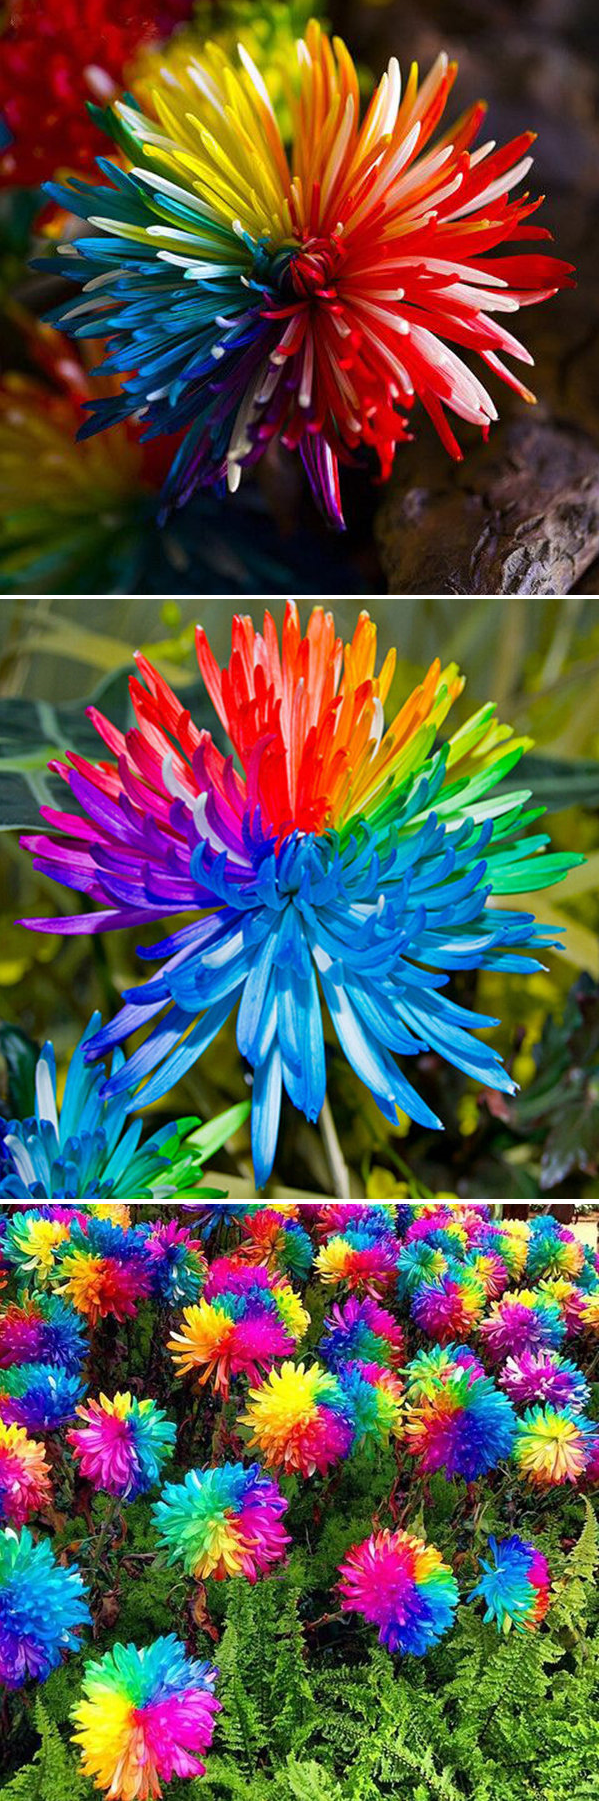 Pcs rainbow chrysanthemum flower seeds rare color home garden